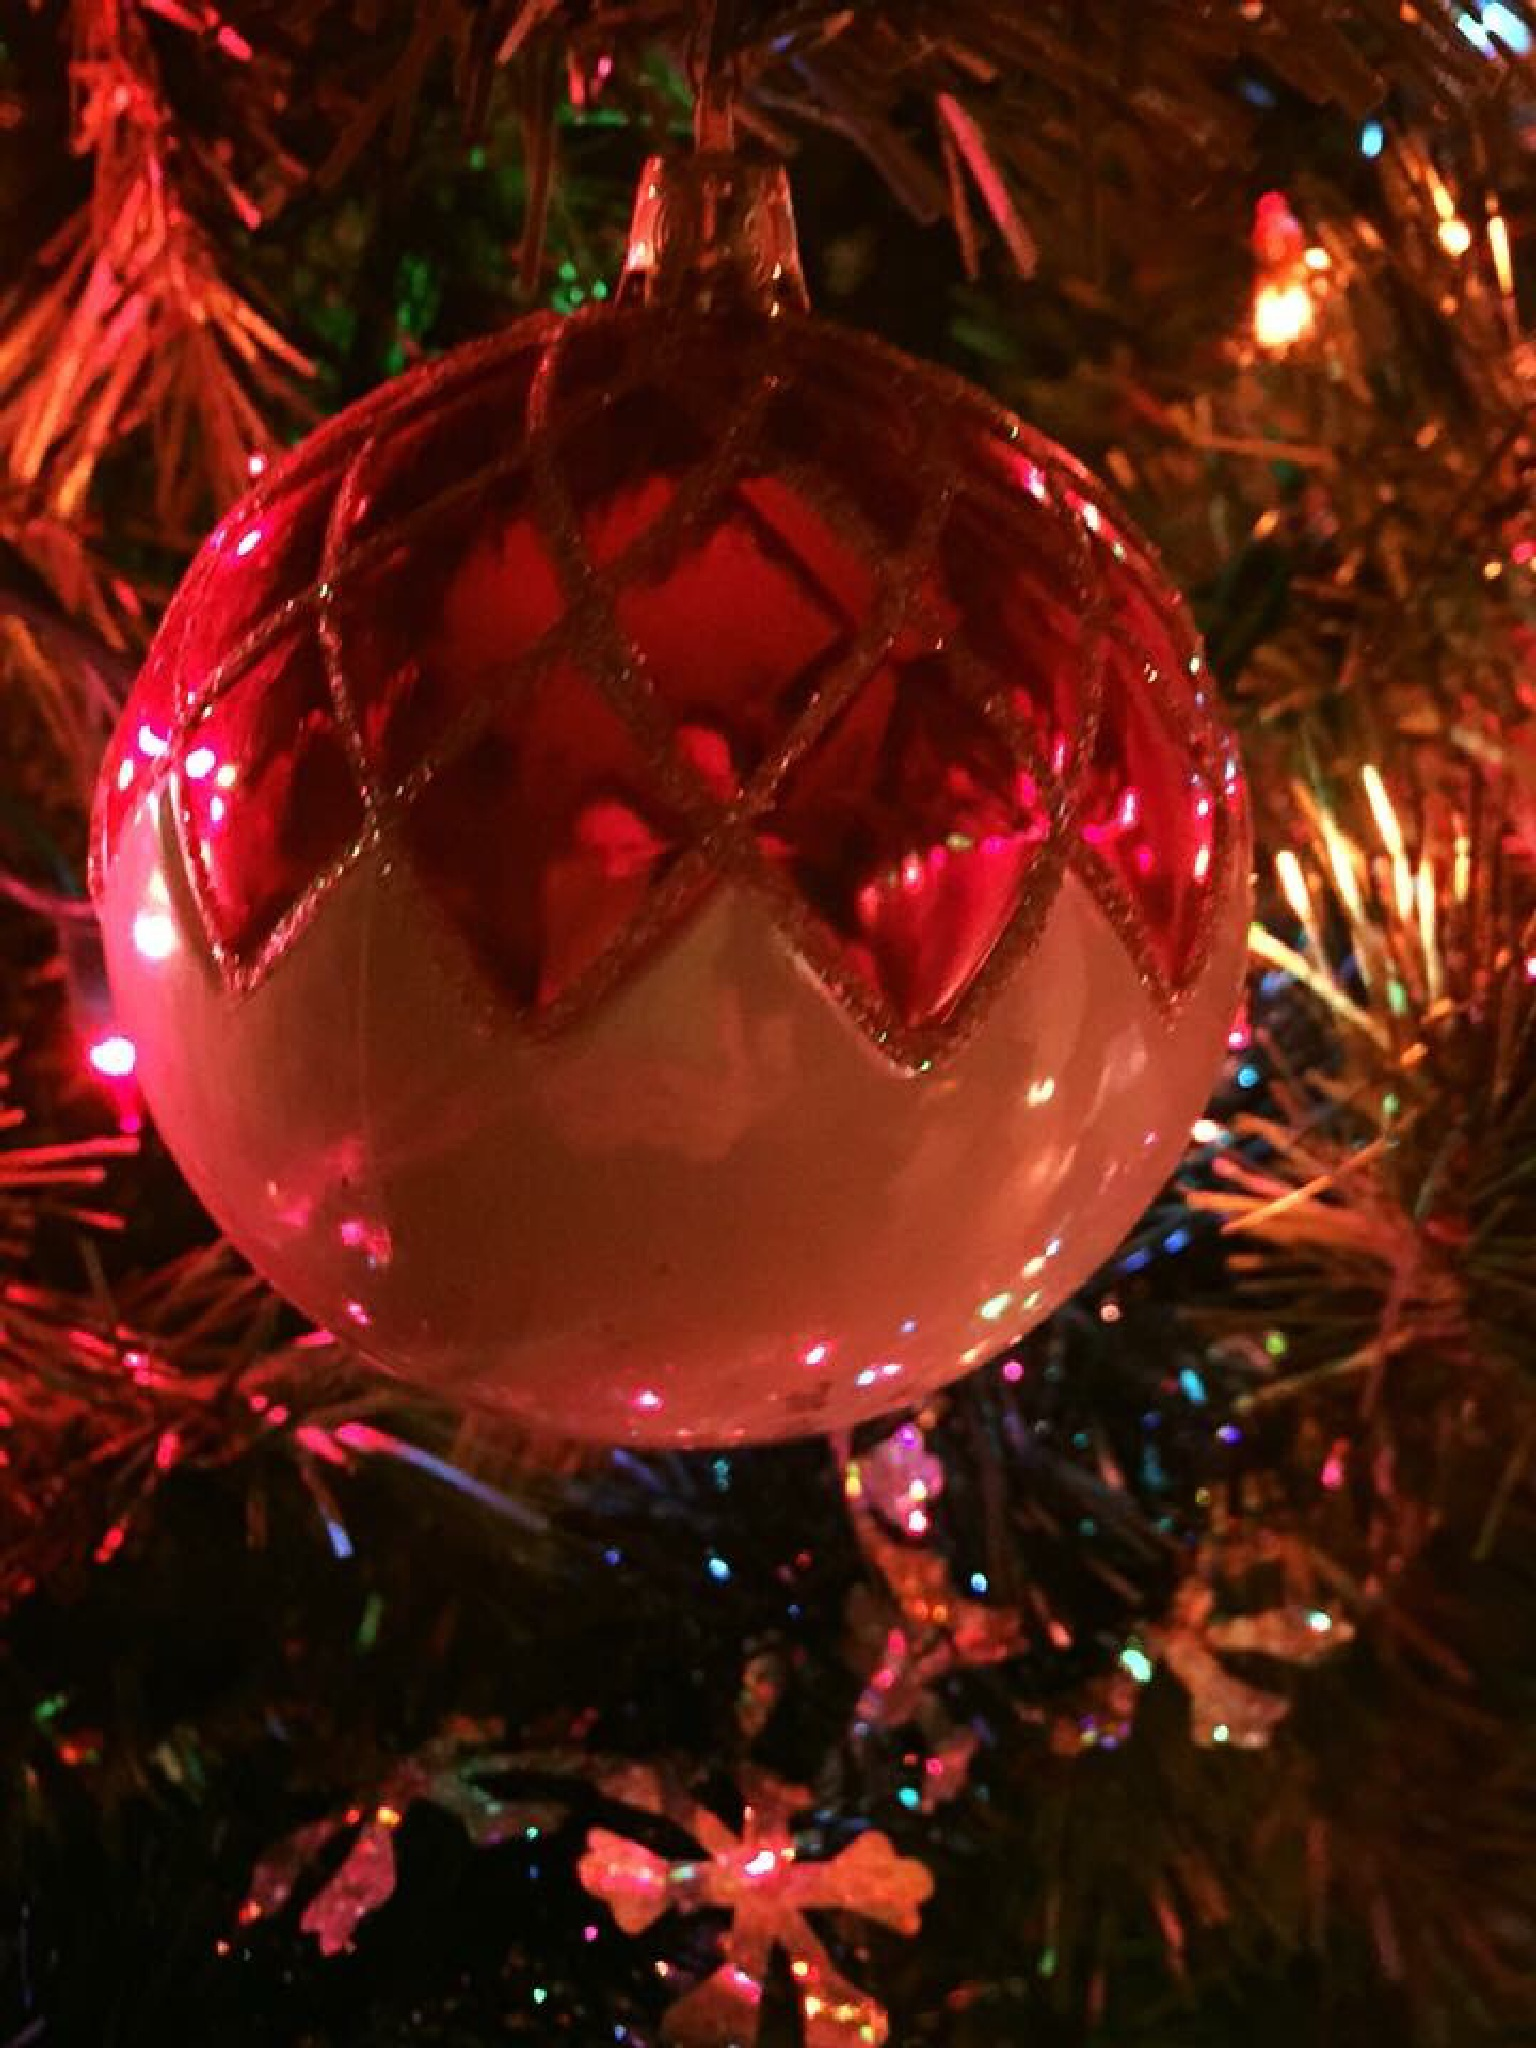 Christmas ornament by Hancock Photography